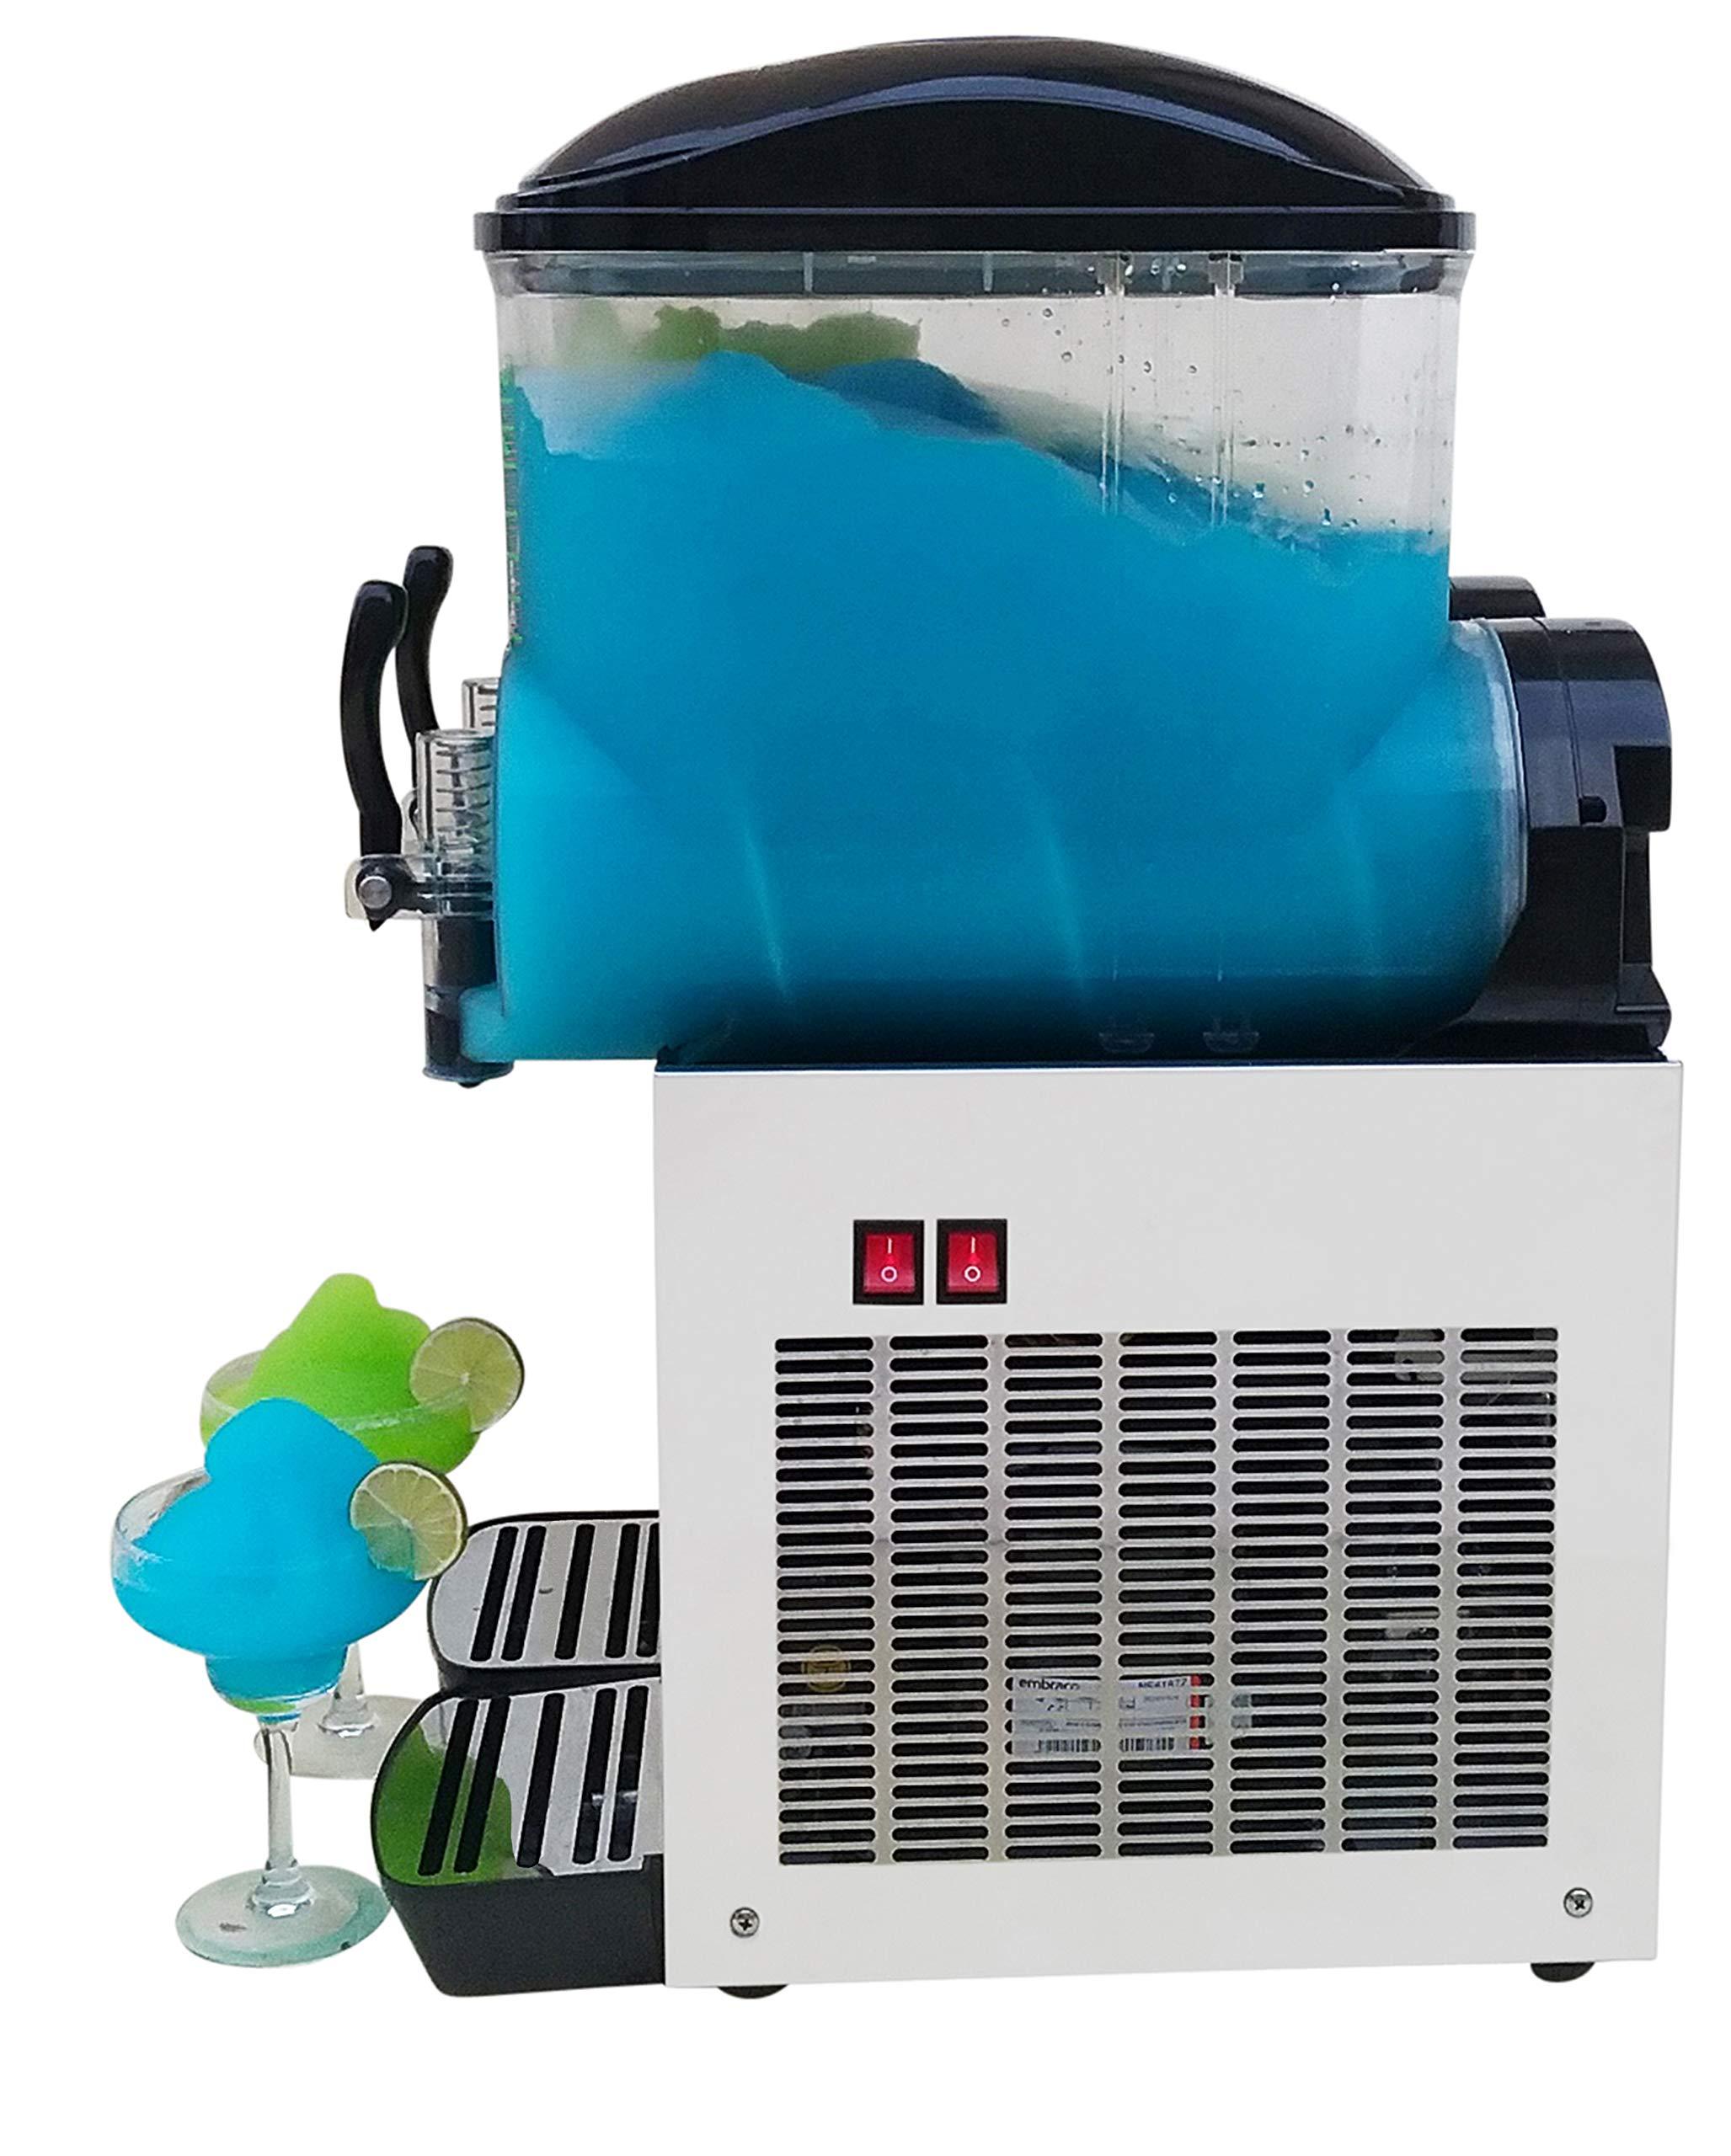 Brand : BRAVO ITALIA 2 bowls slushie machine 3.2 gallons each bowl , 100 CUPS ,COMMERCIAL GRADE MACHINE ,Margarita Machine , Slushie Maker , Margarita Maker , Slushy Machine by BRAVO ITALIA (Image #2)